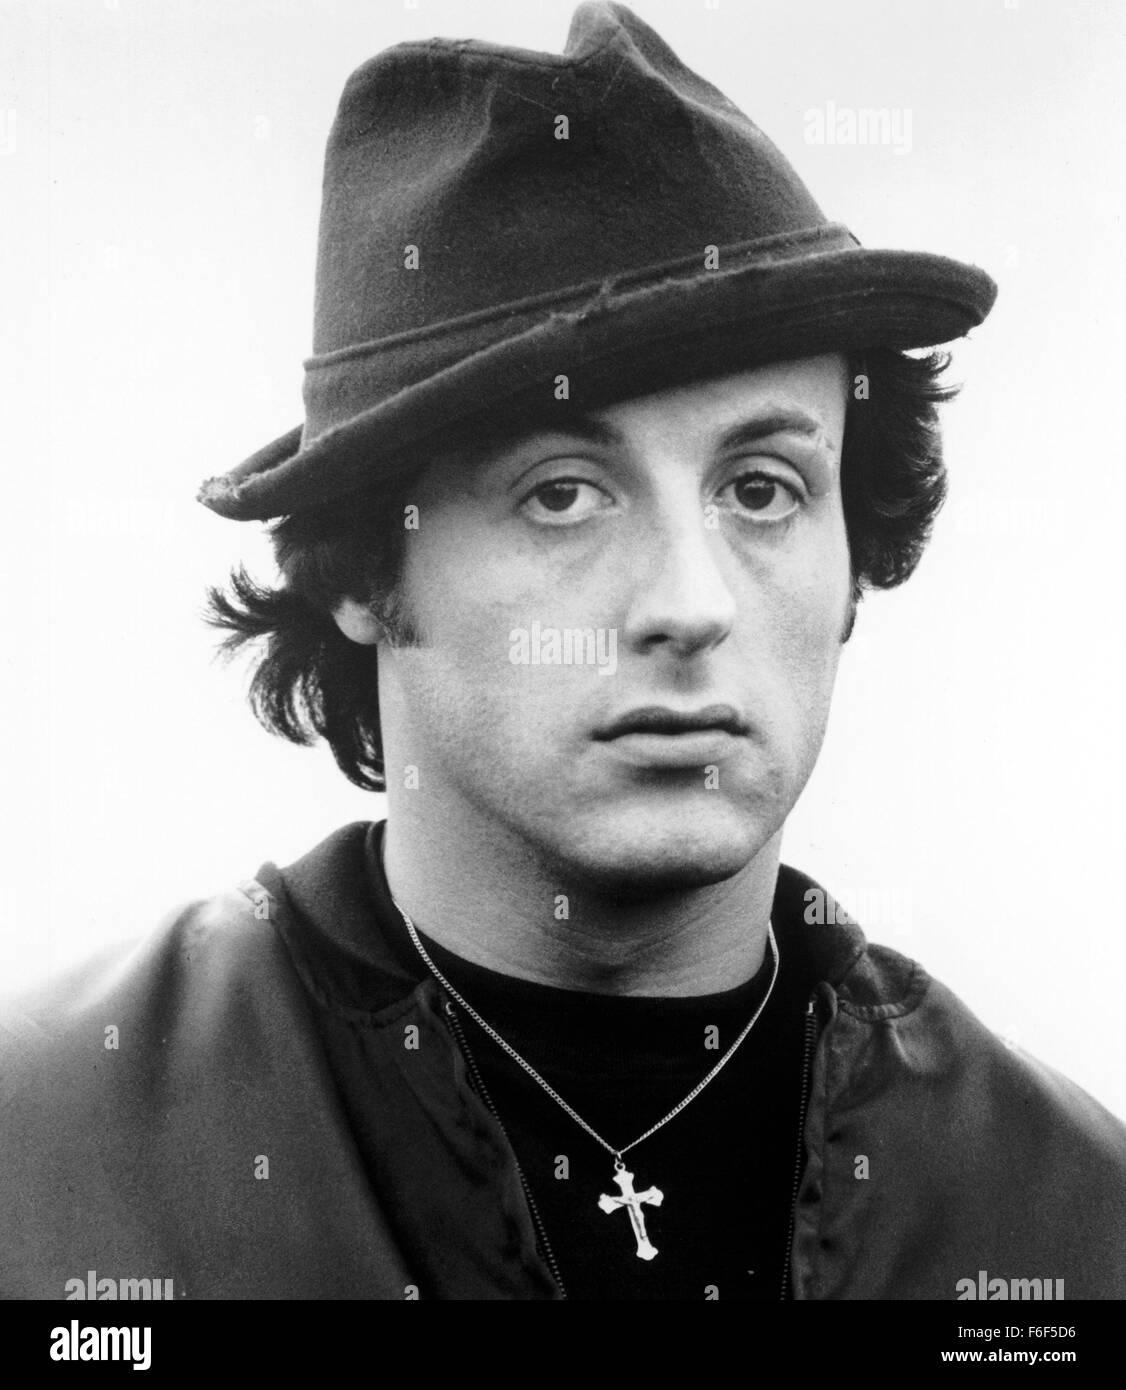 Jun 15, 1979; Philadelphia, PA, USA; SYLVESTER STALLONE as Rocky Balboa in the action, sport, drama 'Rocky II' - Stock Image